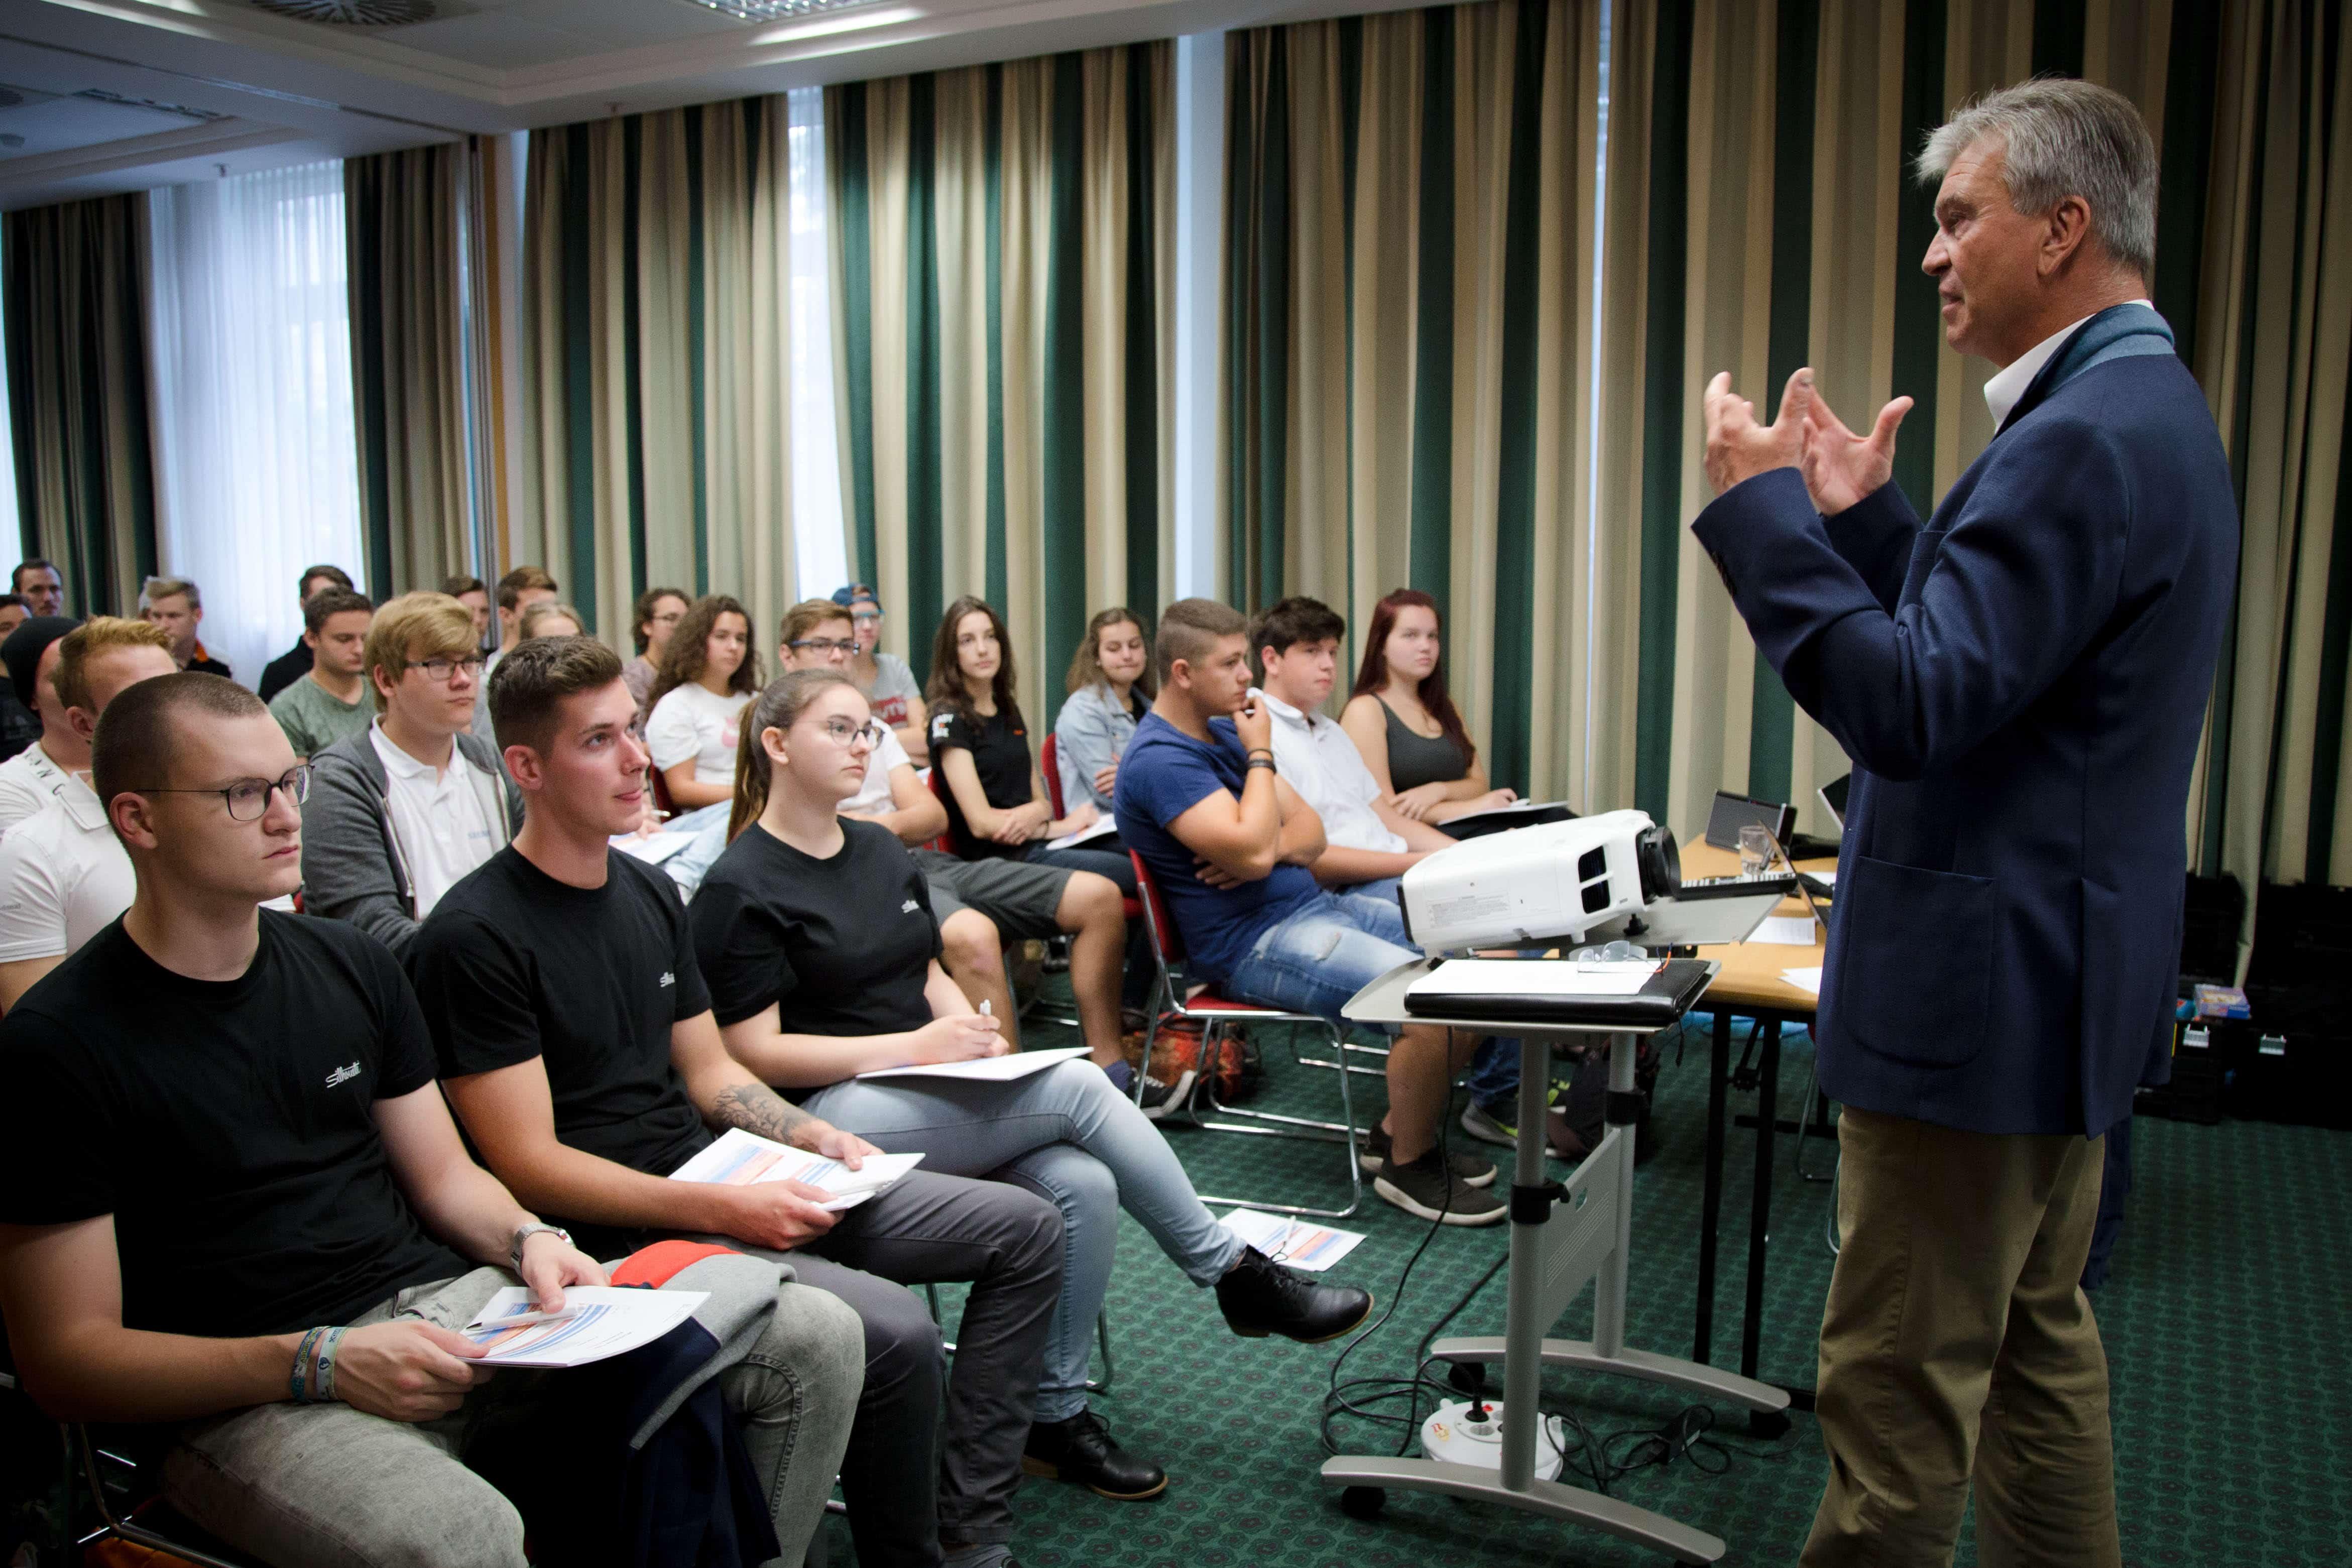 Lehrlings-Workshop erlebnis.lehre. - großartiger Workshoptag mit über 50 Lehrlingen in Kooperation mit HeartBeat